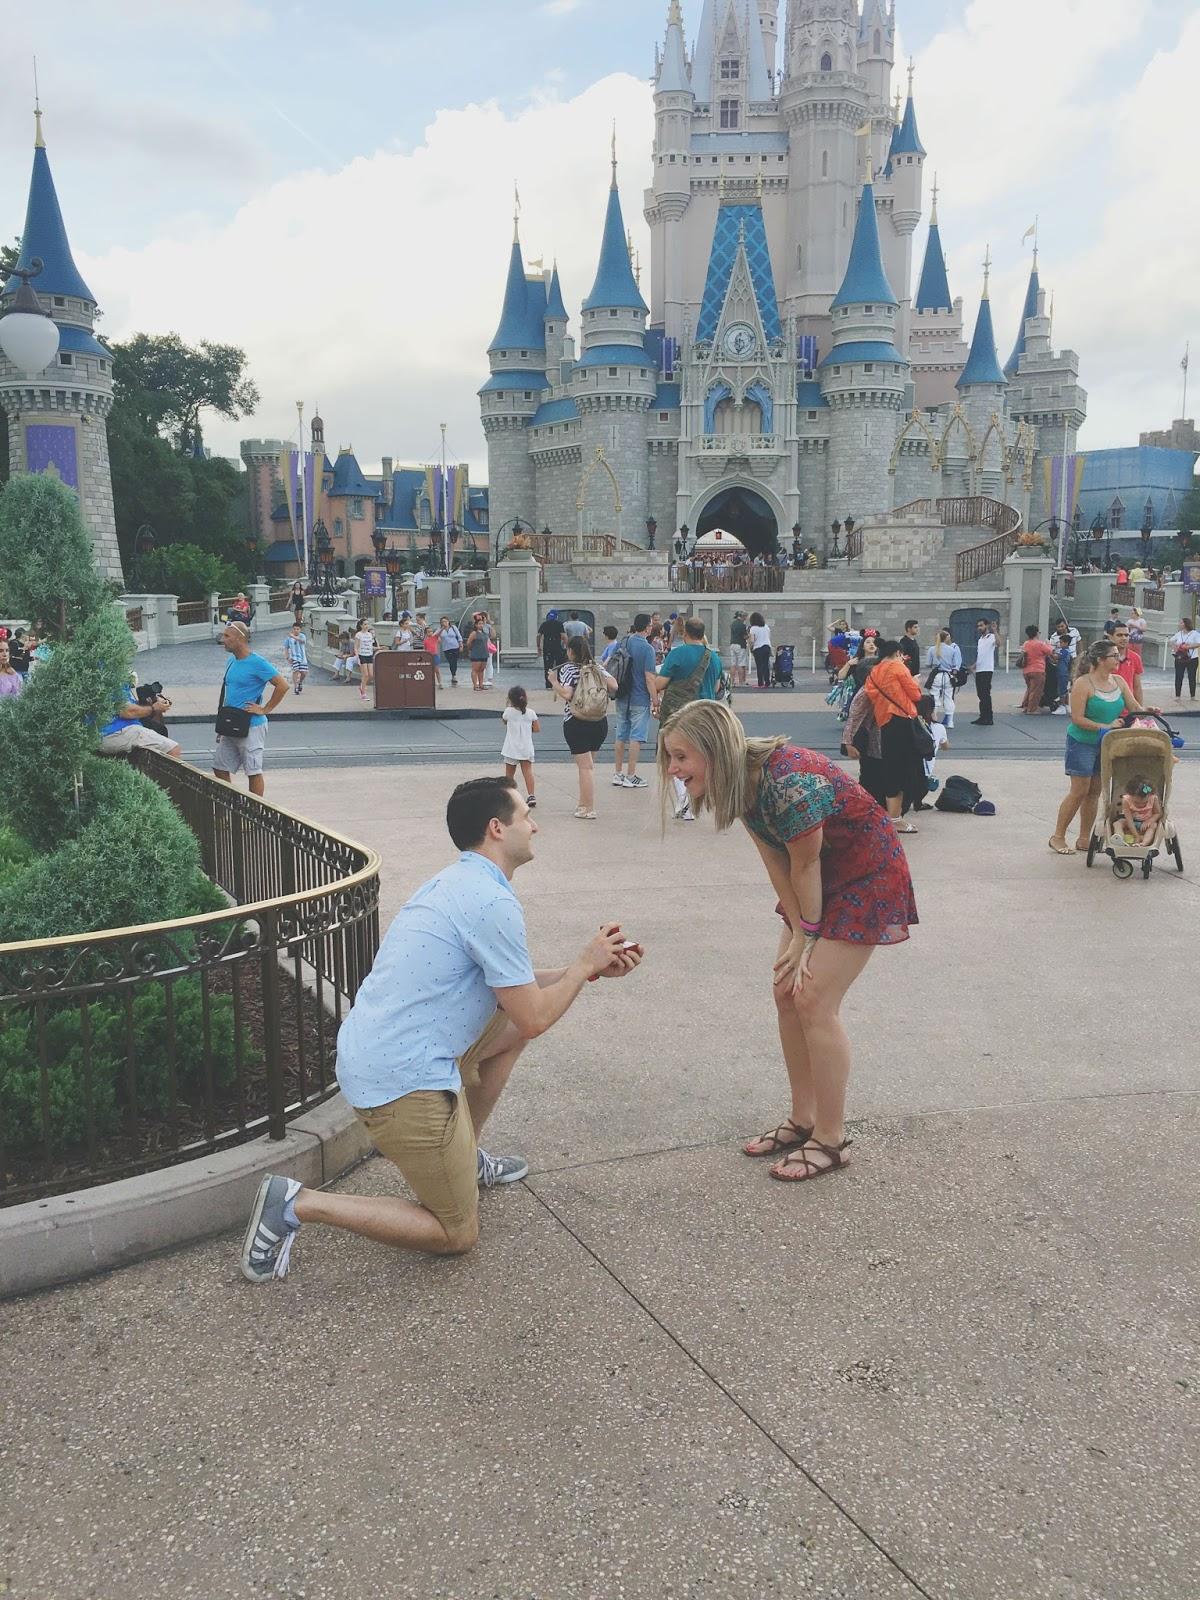 Magic Kingdom in Disney World, Florida